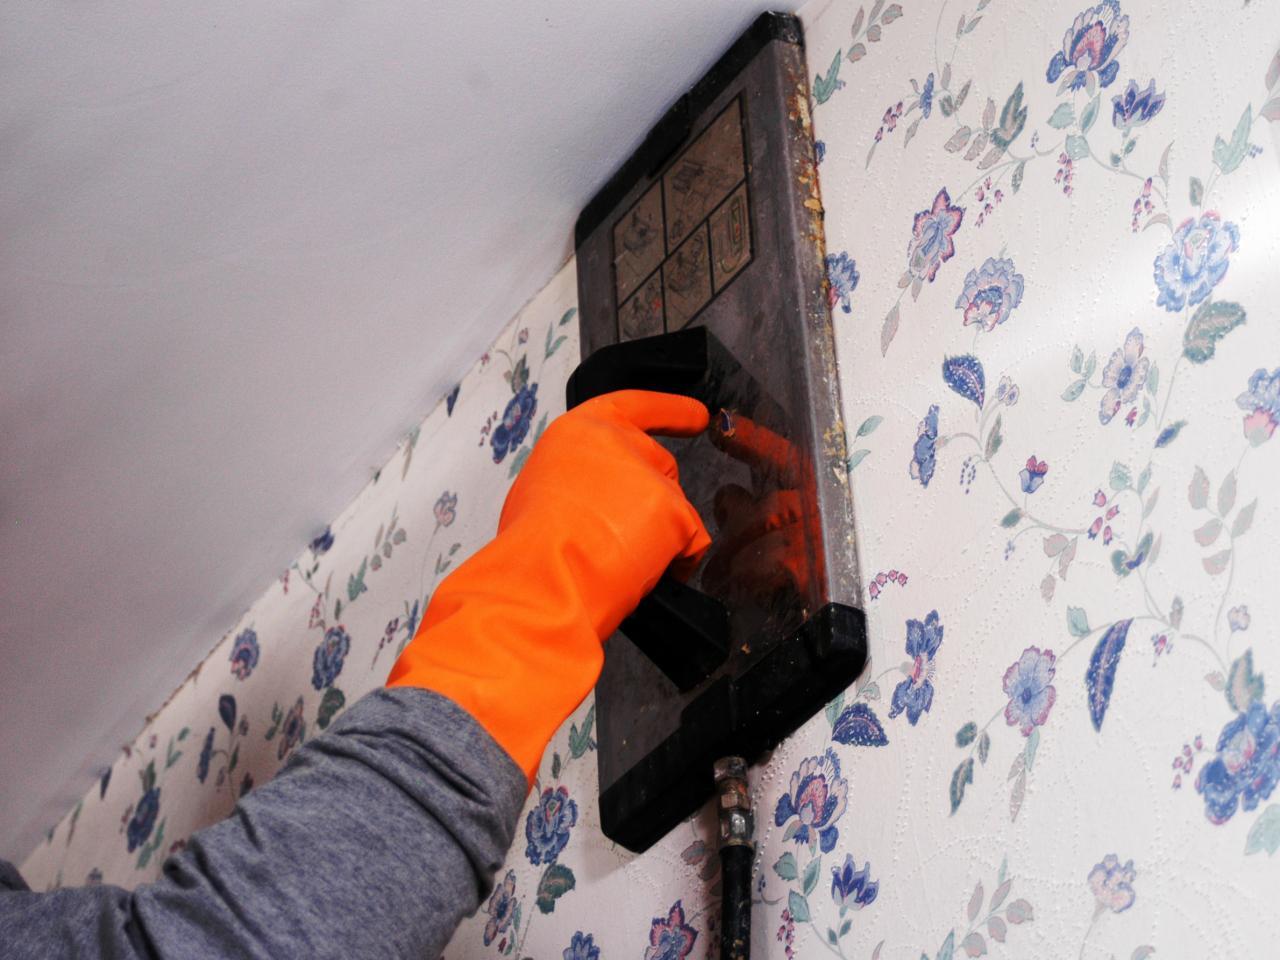 Siapkan Peralatan - Urutan Cara Memasang Wallpaper Dinding Agar Hasilnya Tahan Lama - HGTV.com